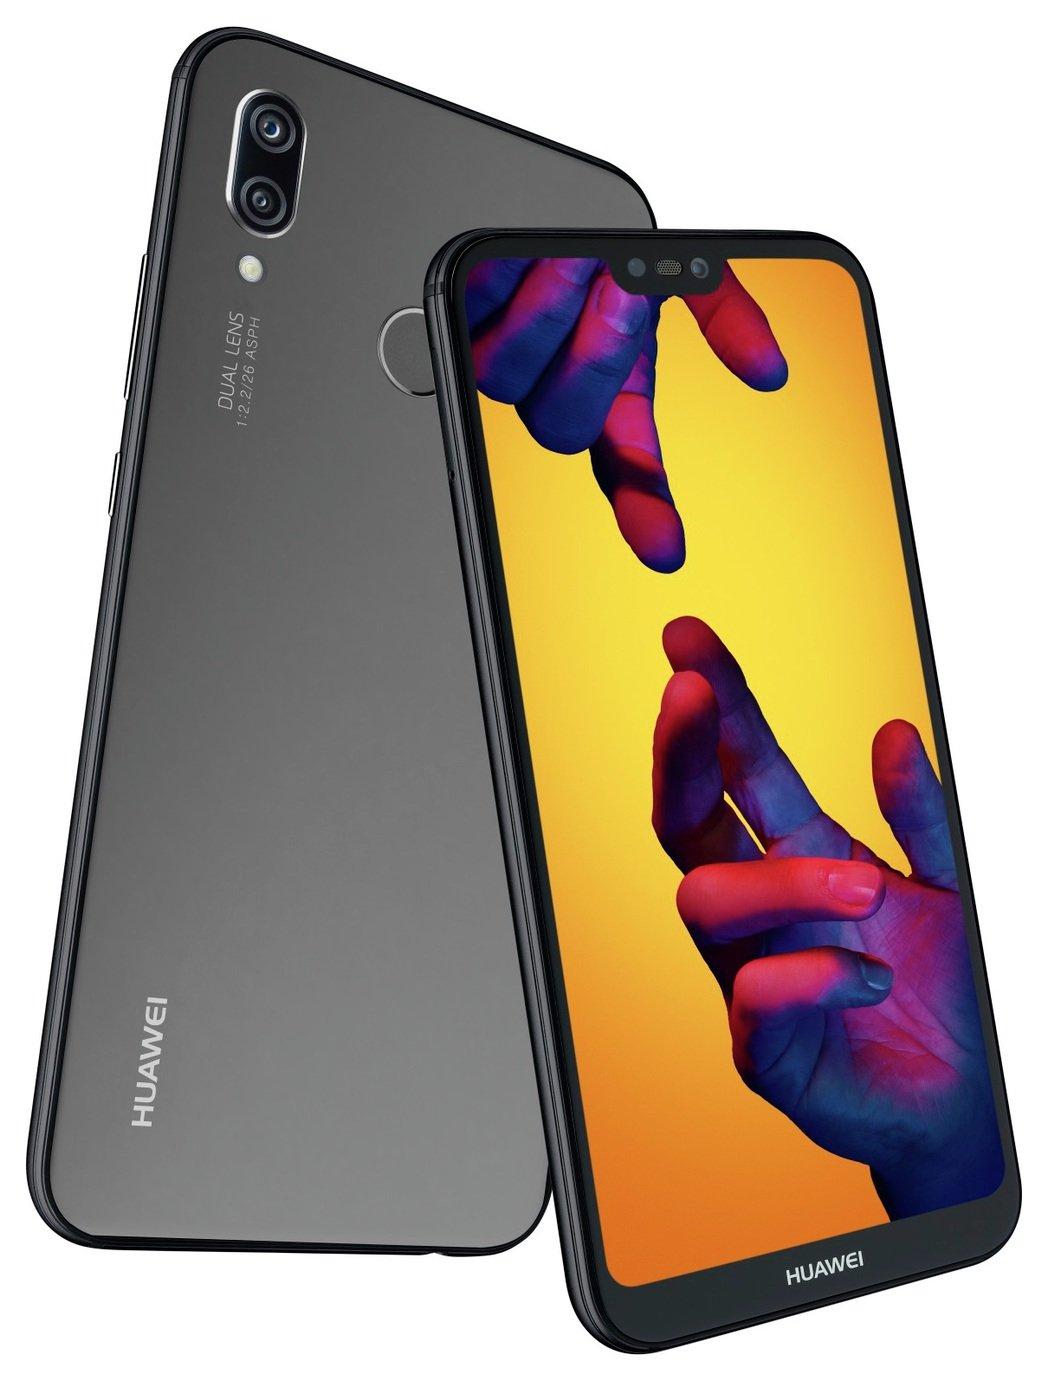 Huawei P20 lite sim free £179.95 at Argos plus get £10 voucher